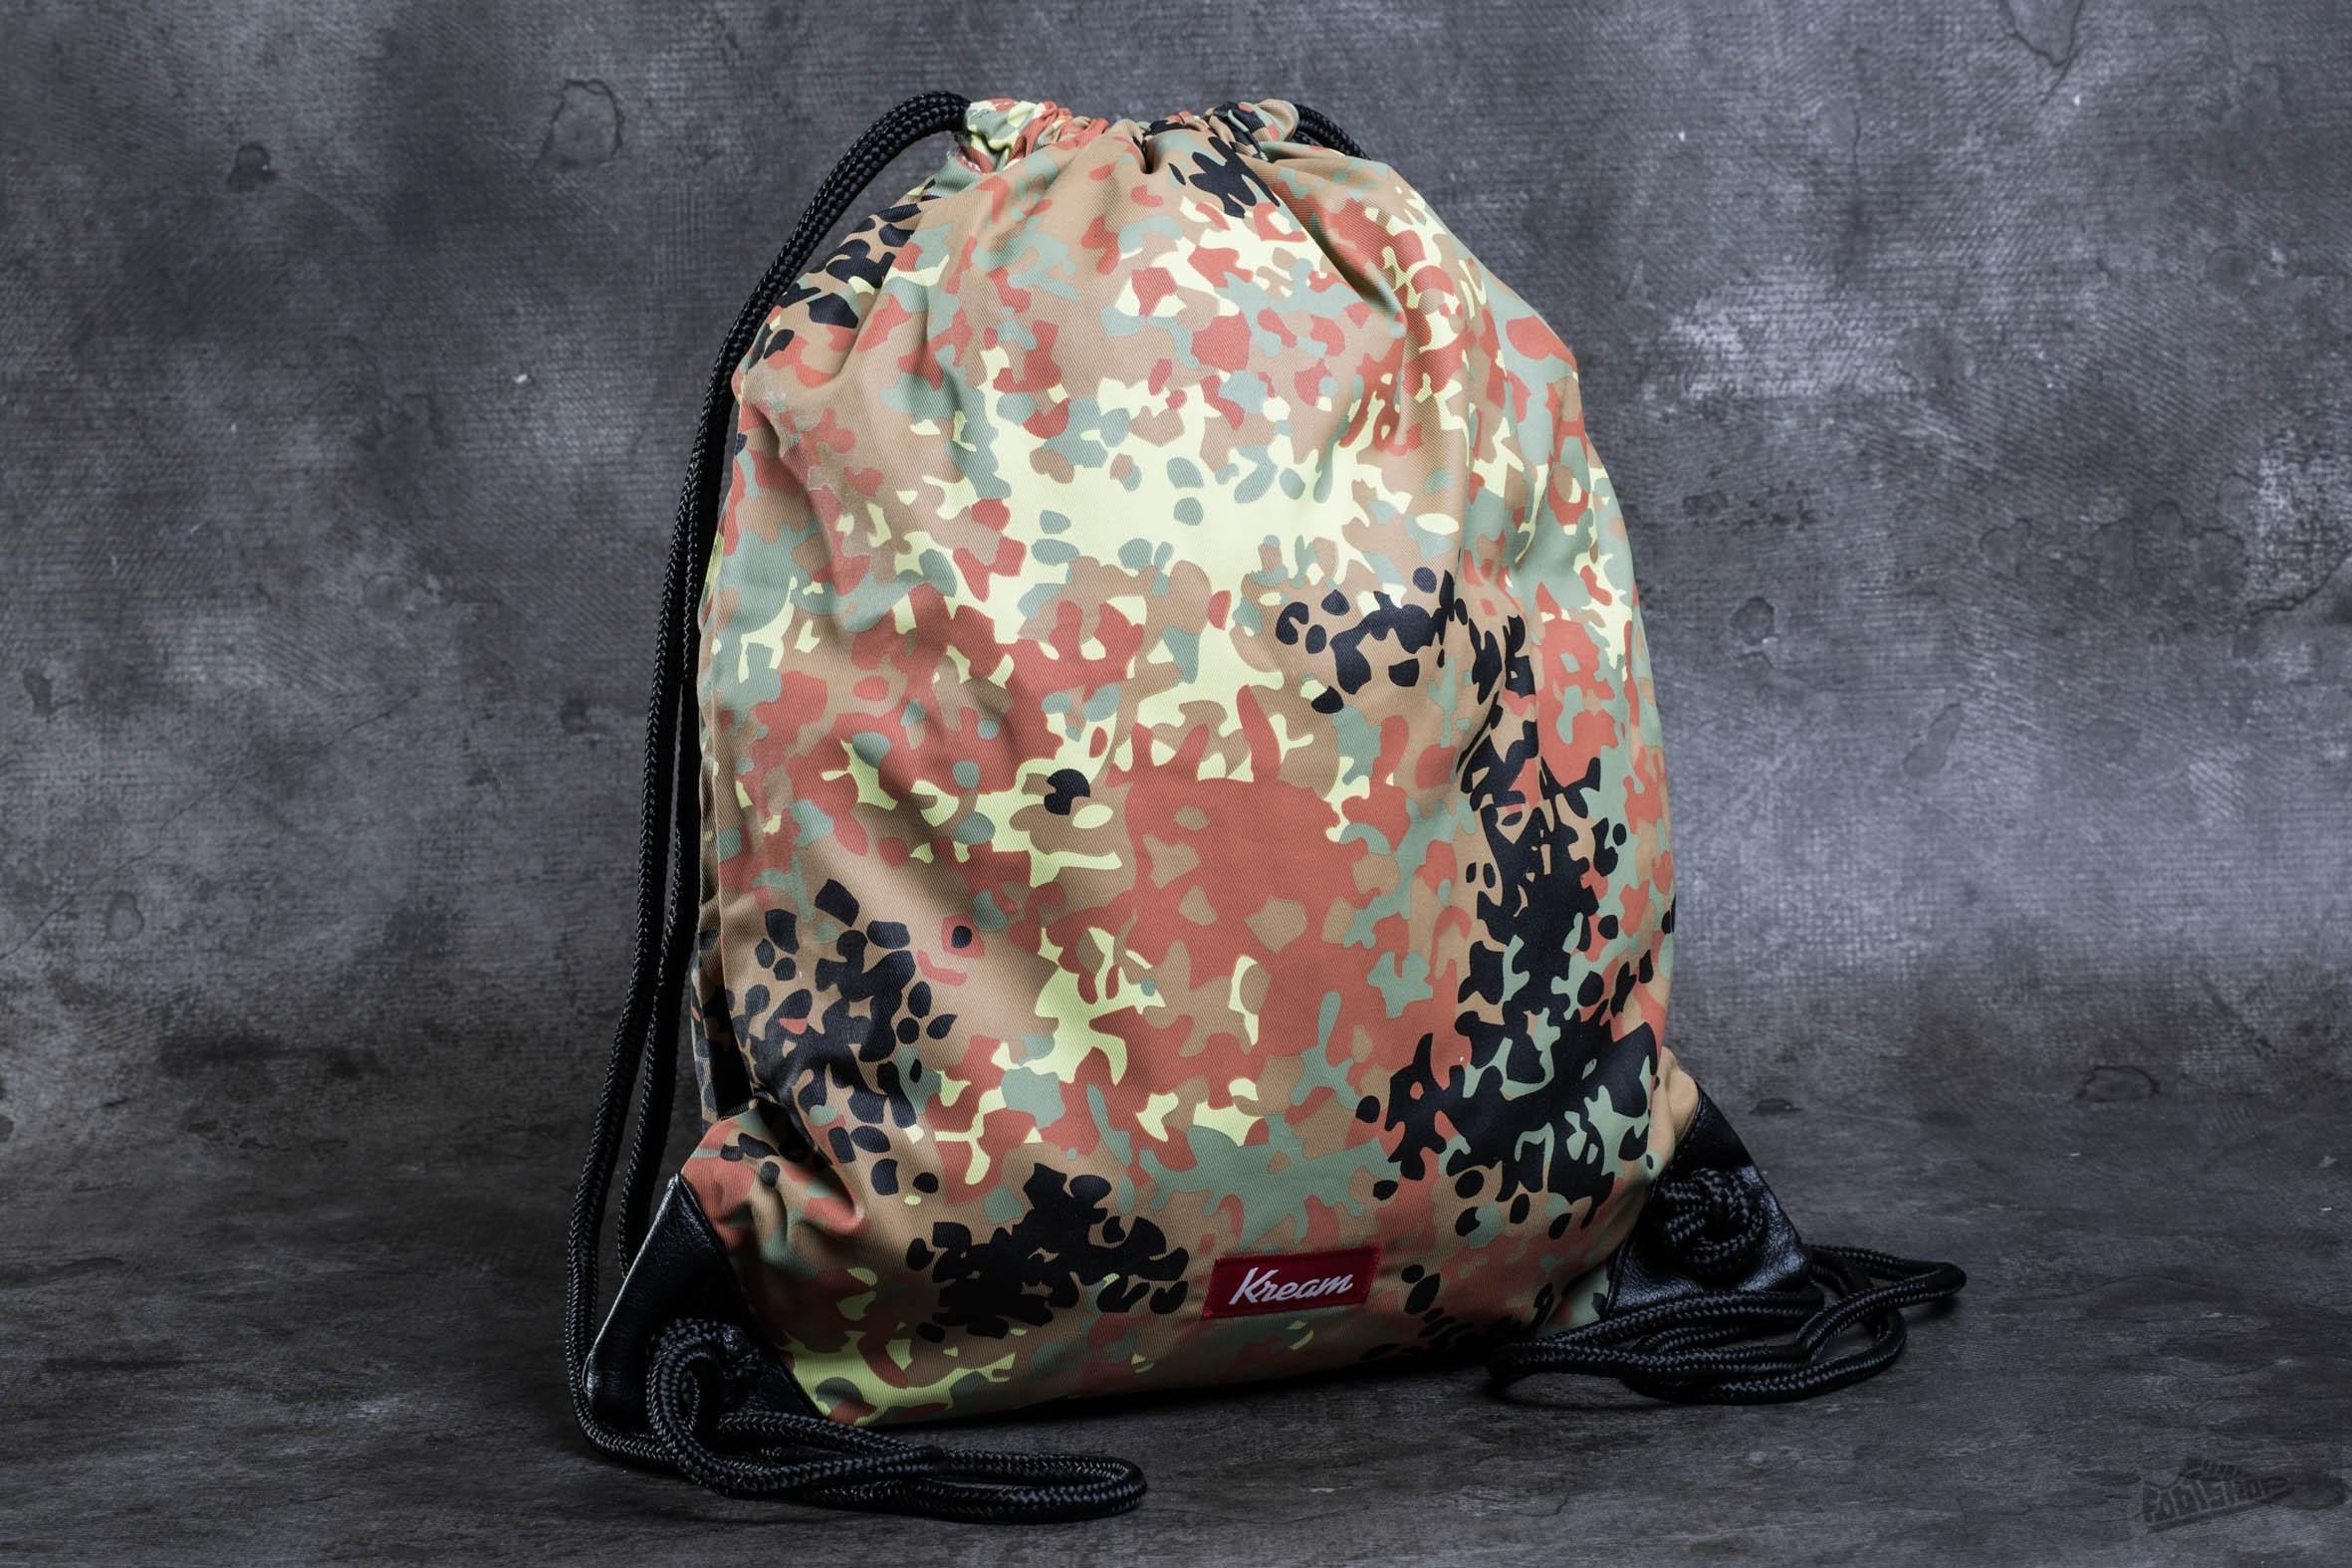 Kream Duck Down Bag Black/ Multi Colors